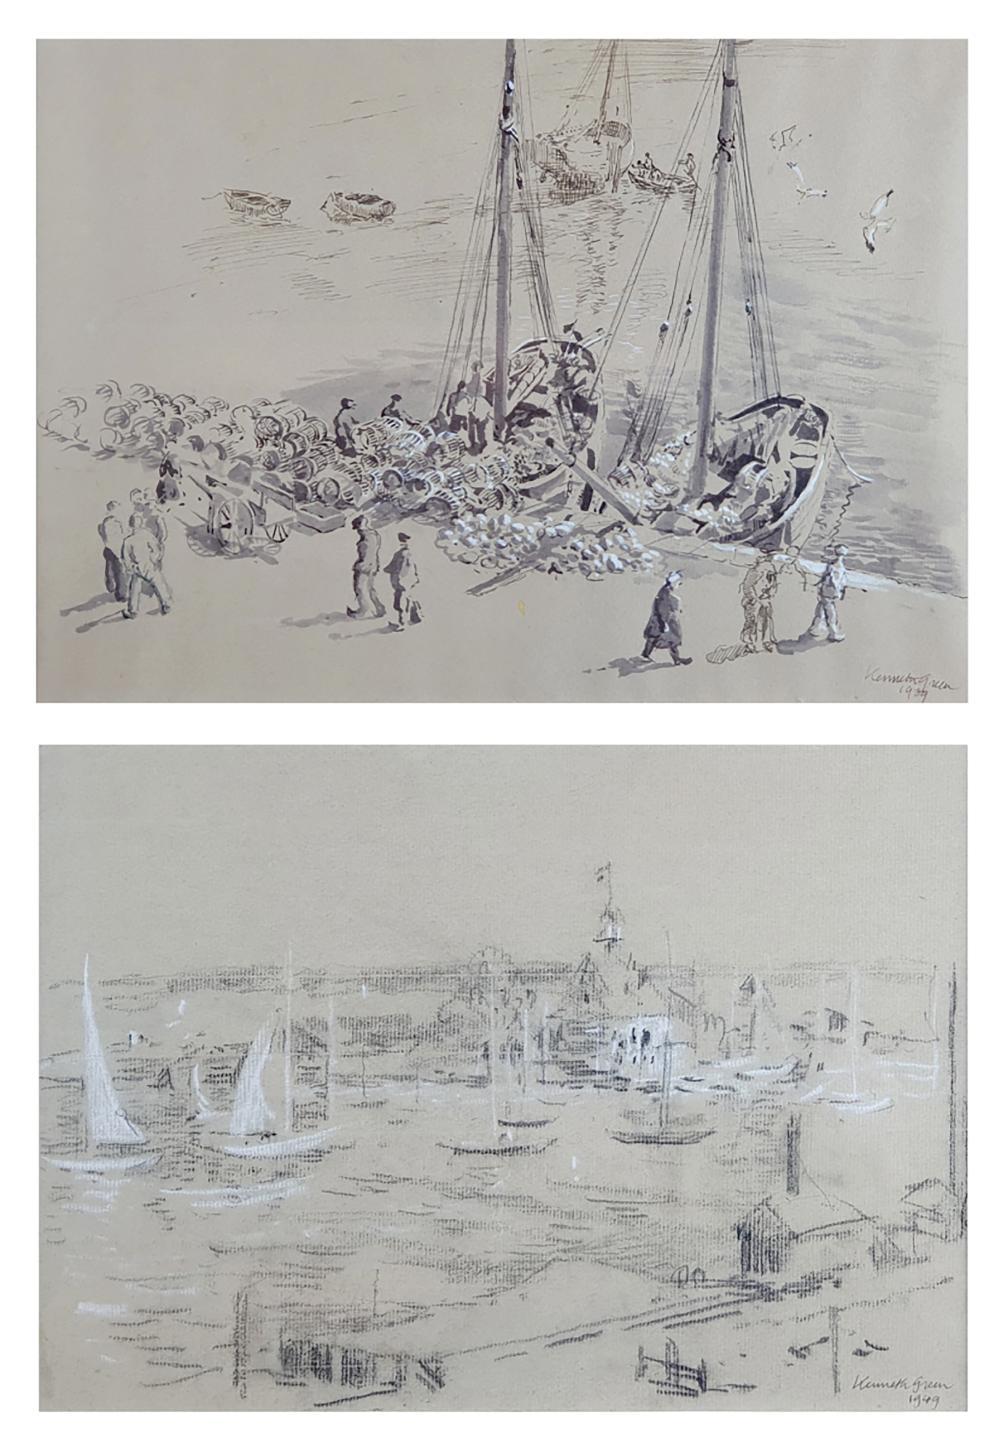 KENNETH GREEN (1905-1986) Scènes portuaires